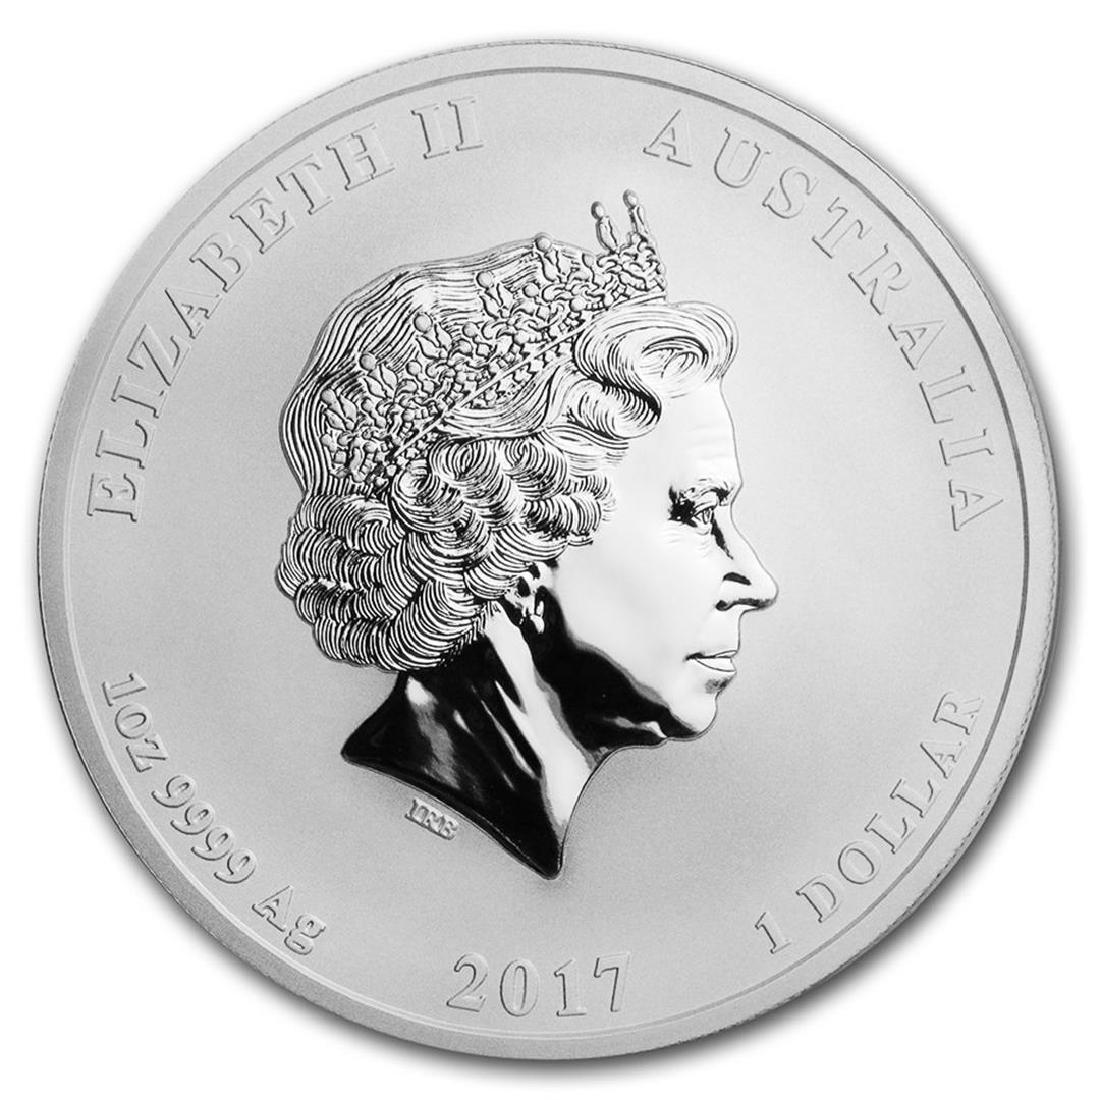 2017-P Australia $1 Dragon & Phoenix Silver Coin - 2